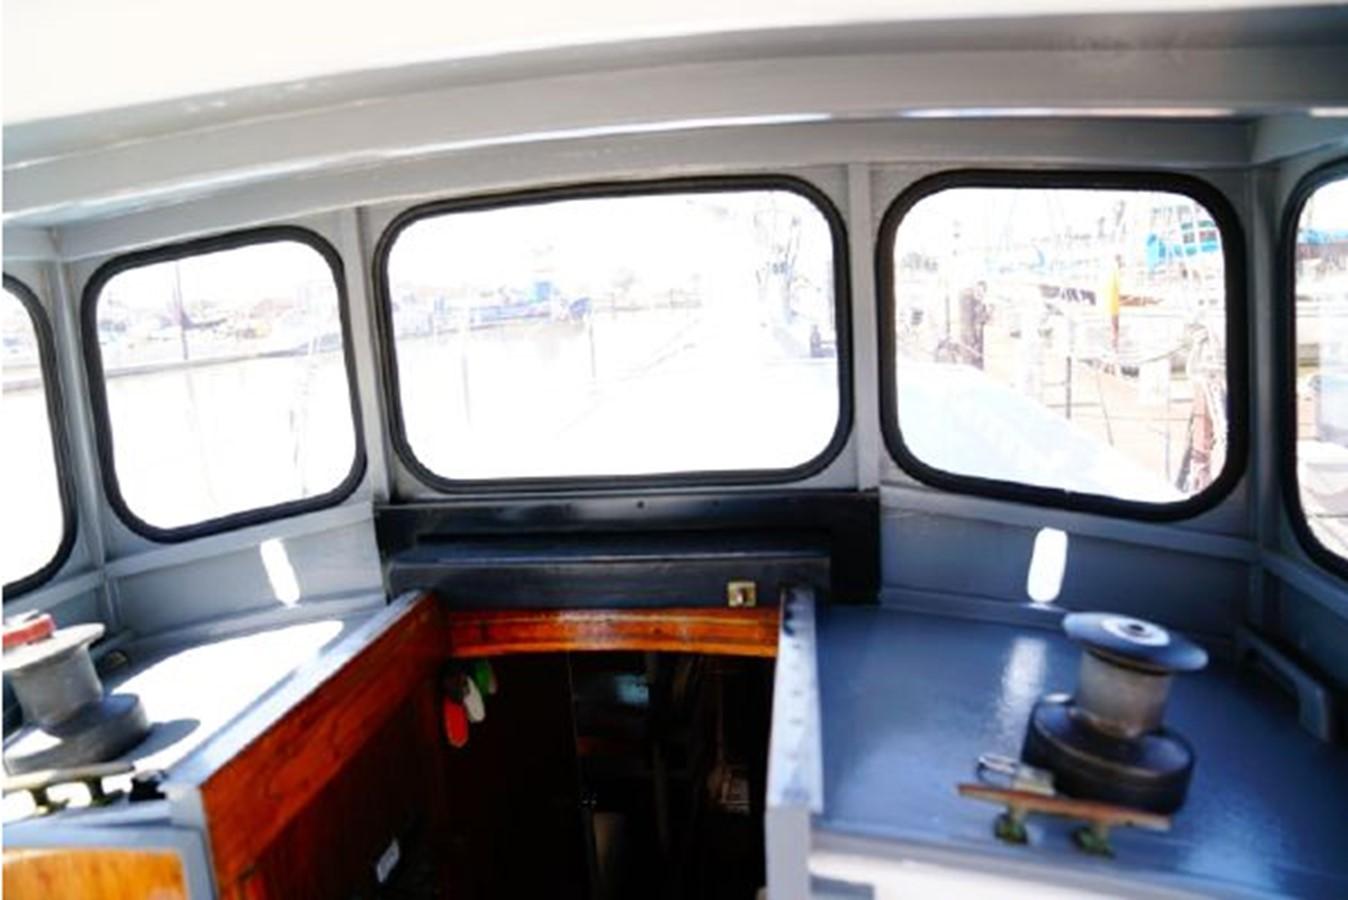 1992 CUSTOM Sailboat High Endurance World Beater Cruising Sailboat 2617779